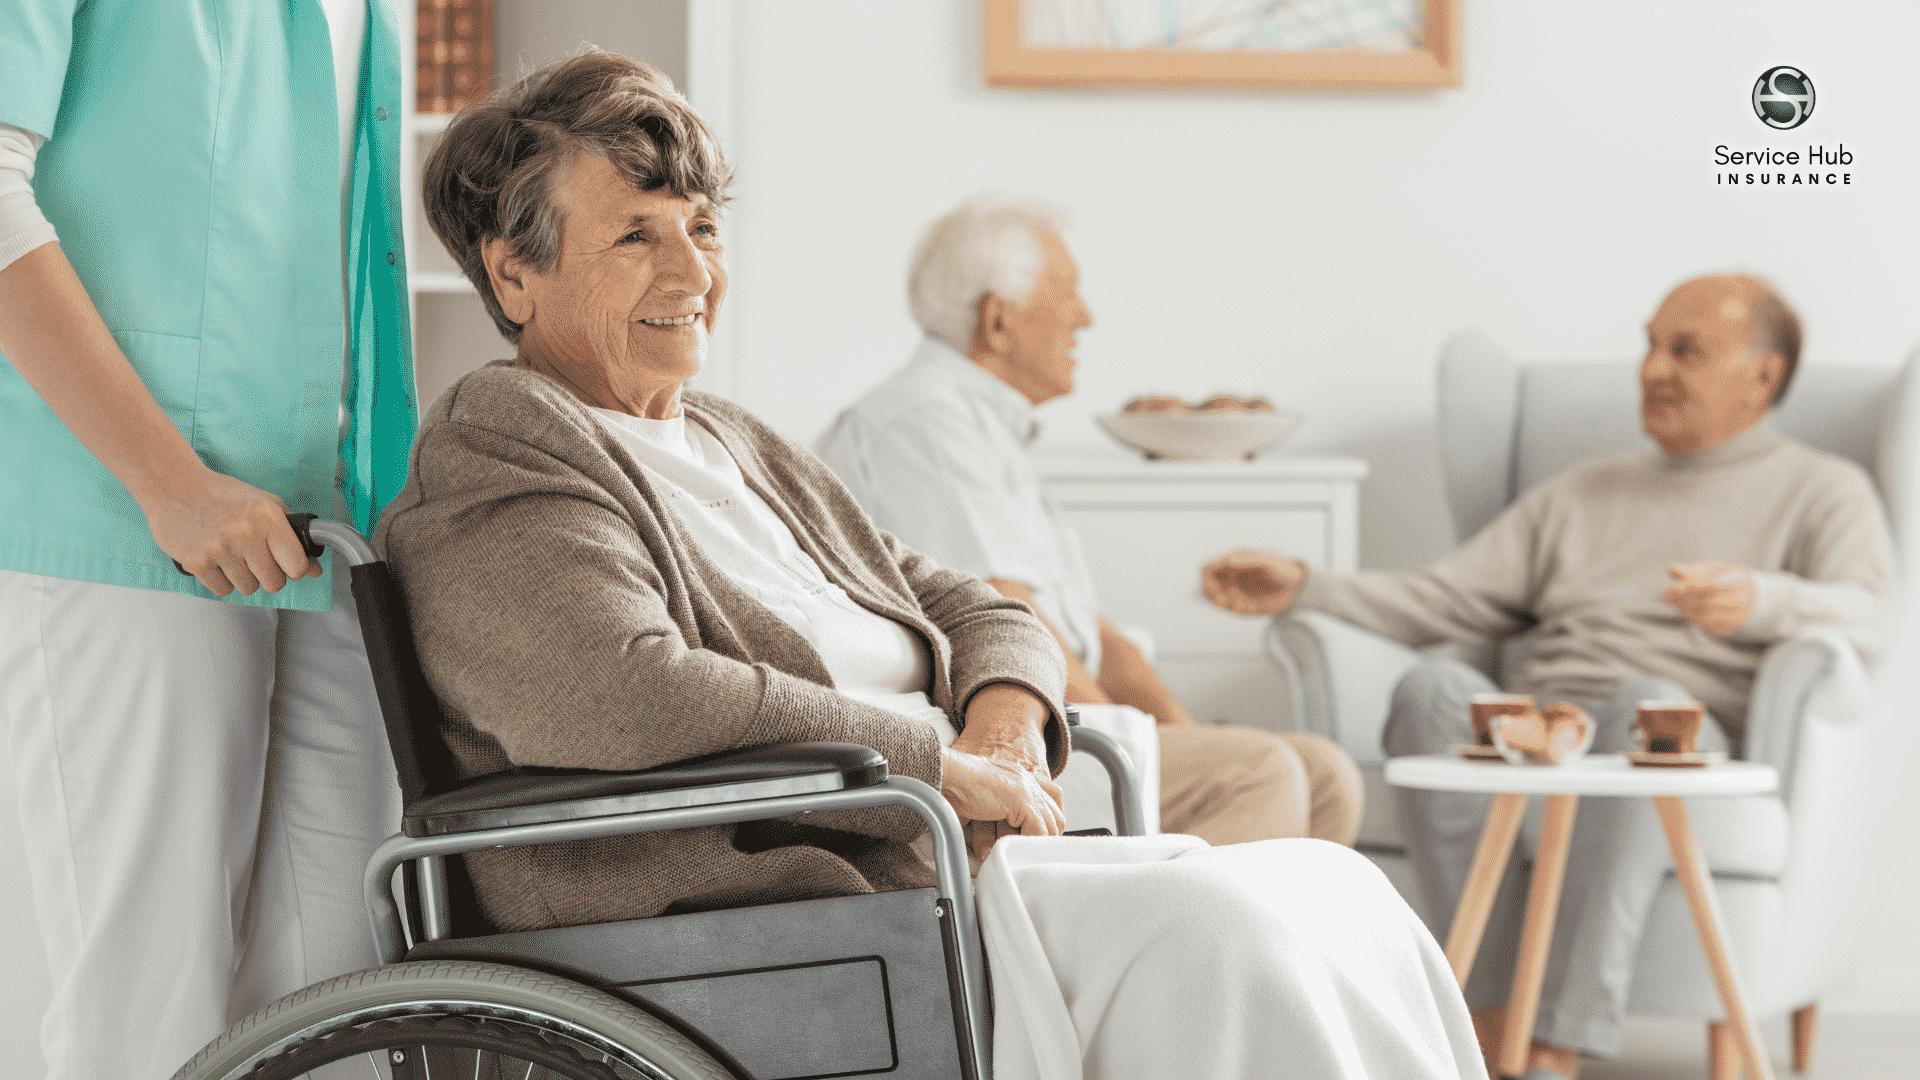 Long-Term Insurance - Service Hub Insurance